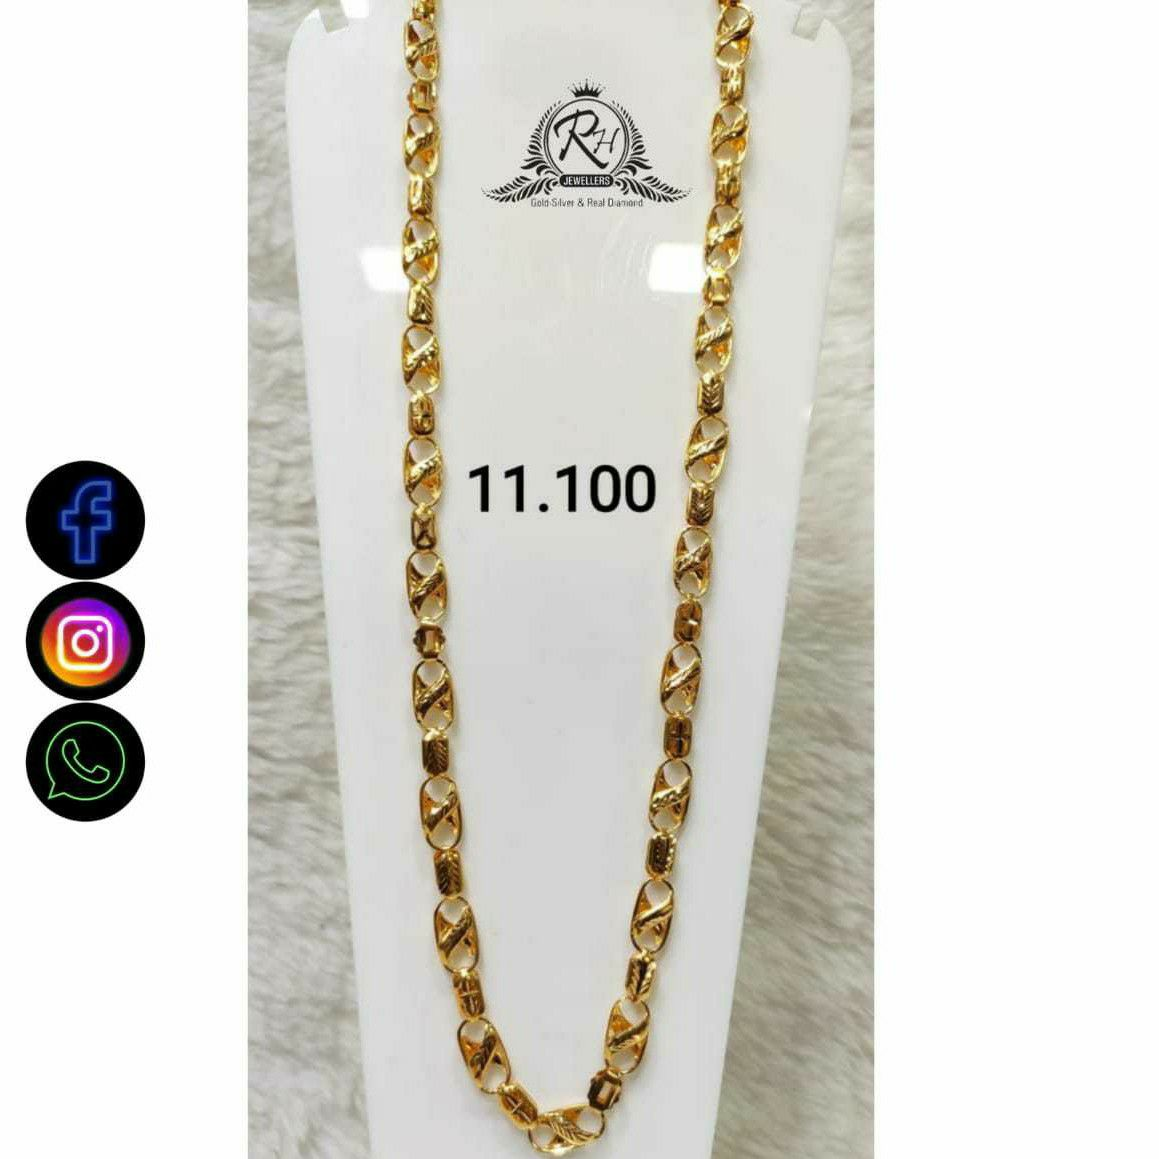 22 Carat Gold Antiq Gents Chain RH-CH779